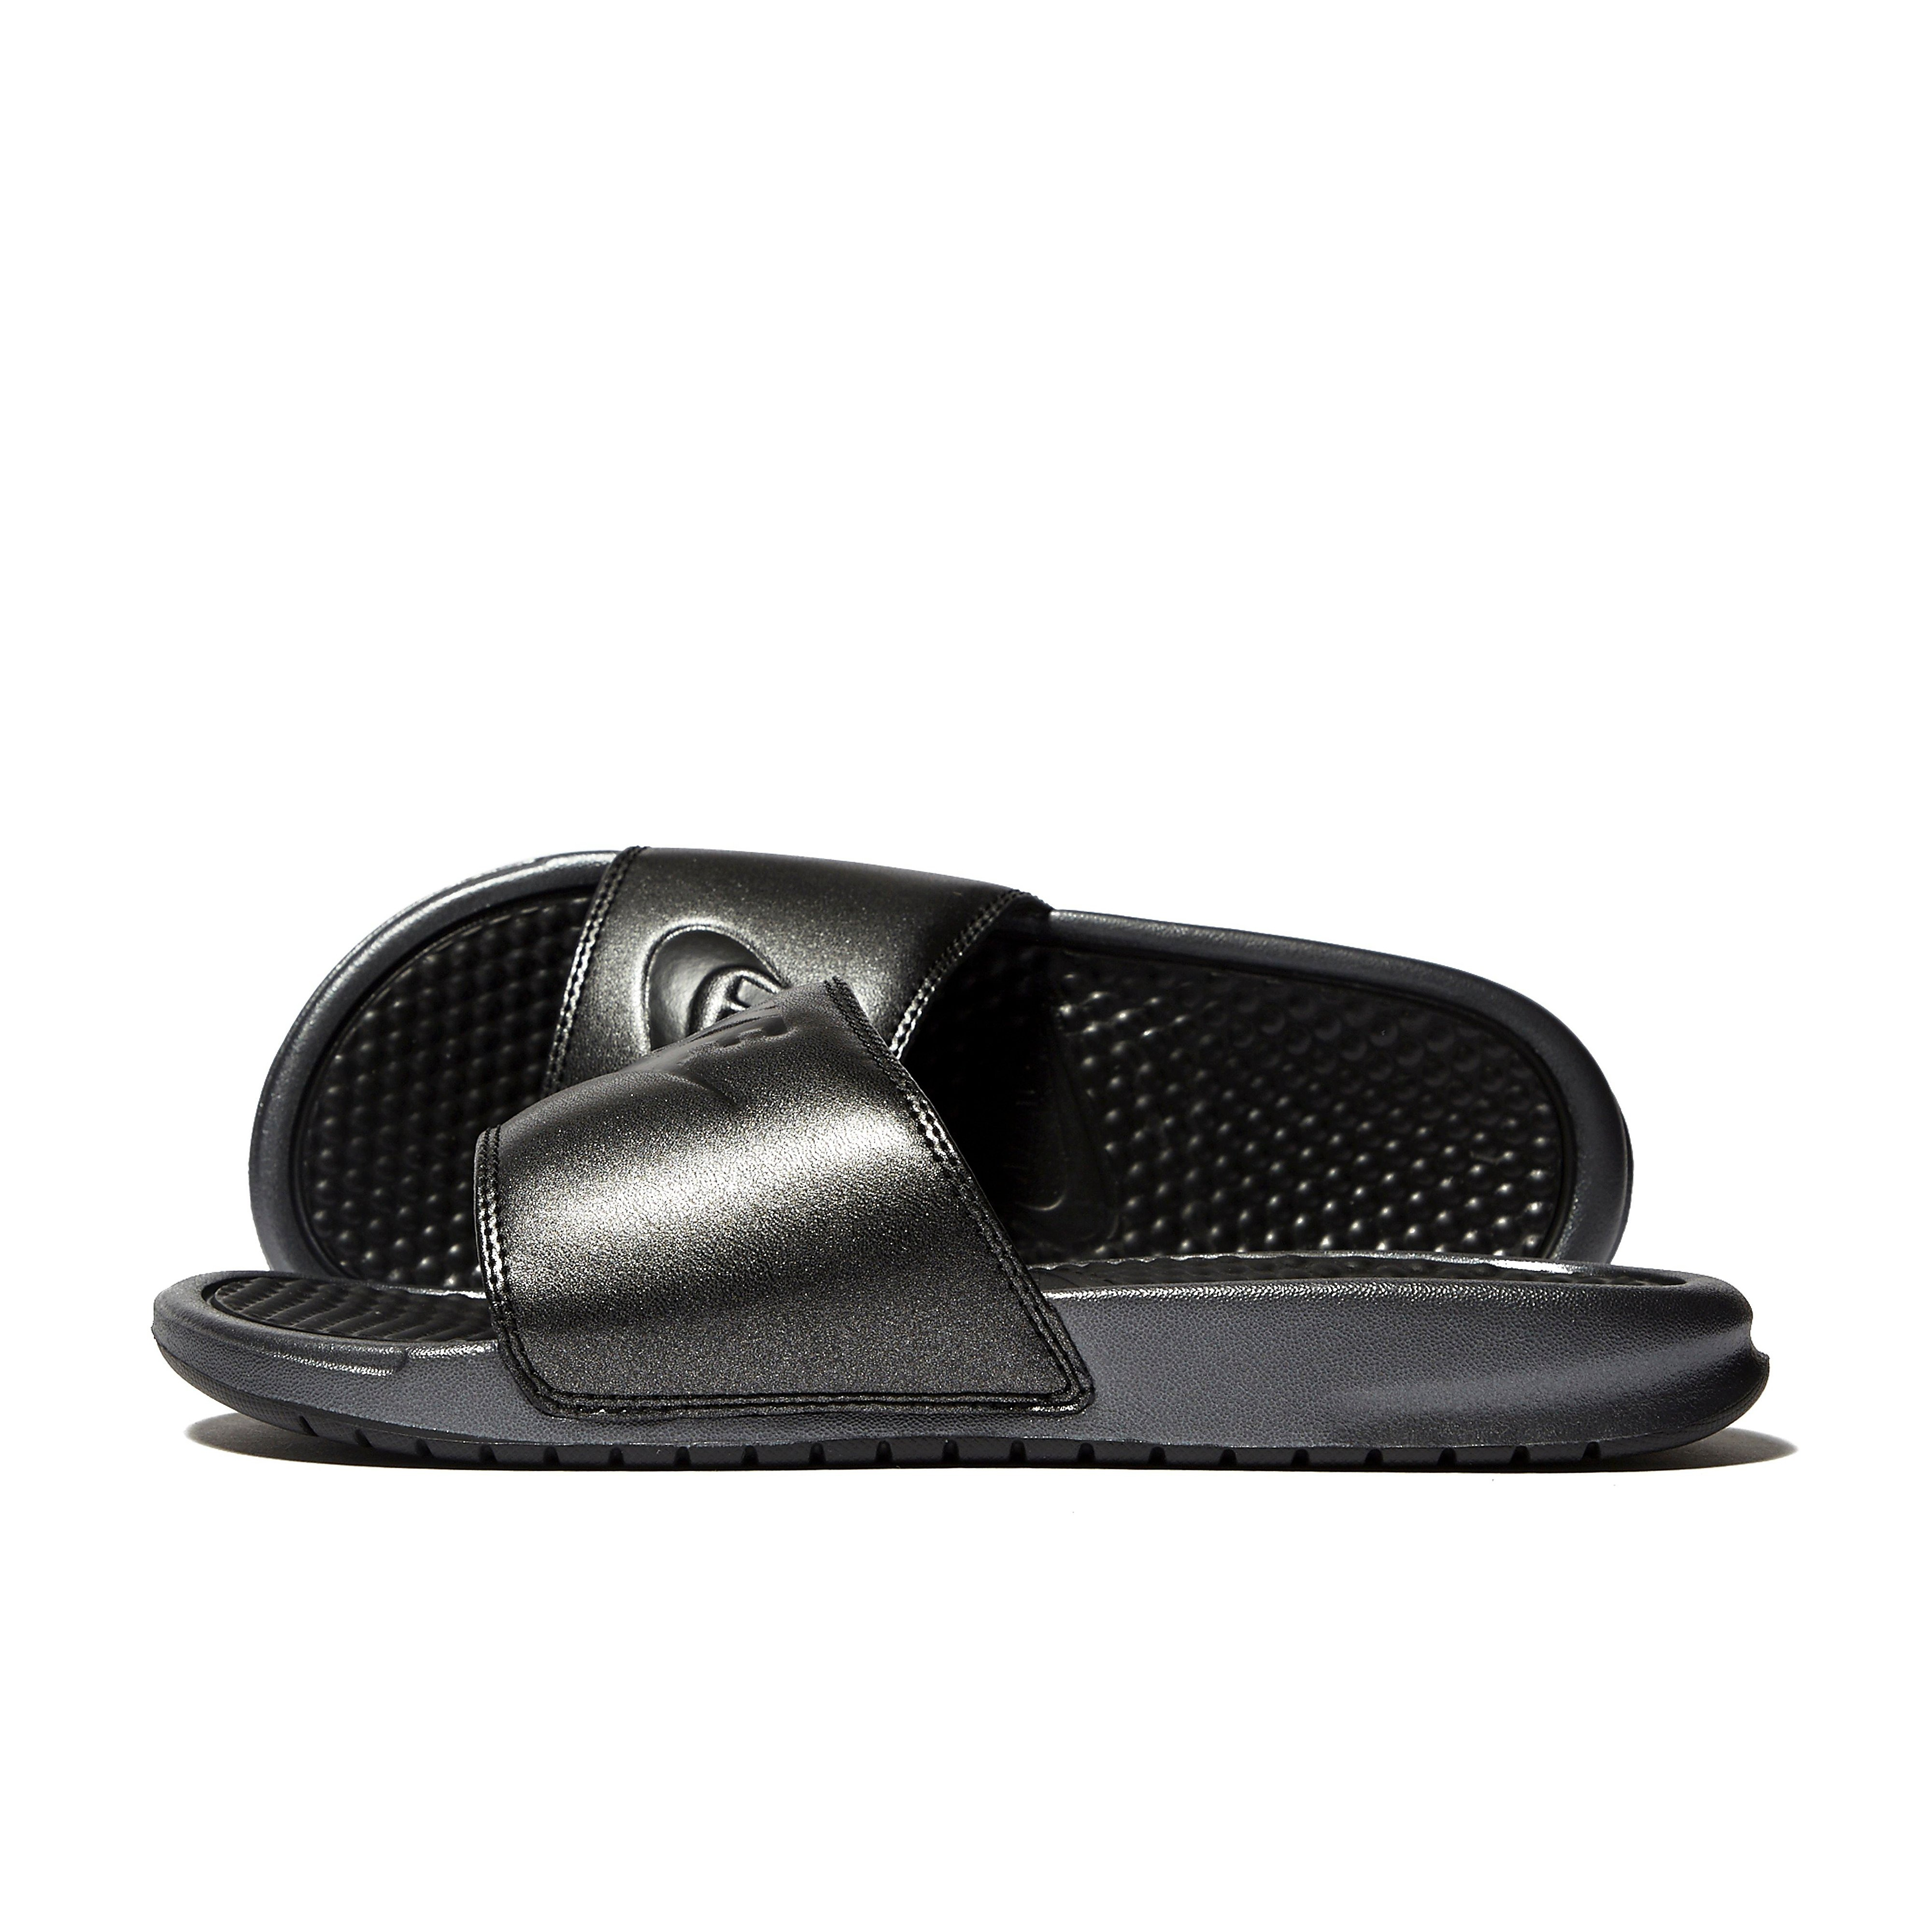 Nike Benassi QS Women's Slide Sandals